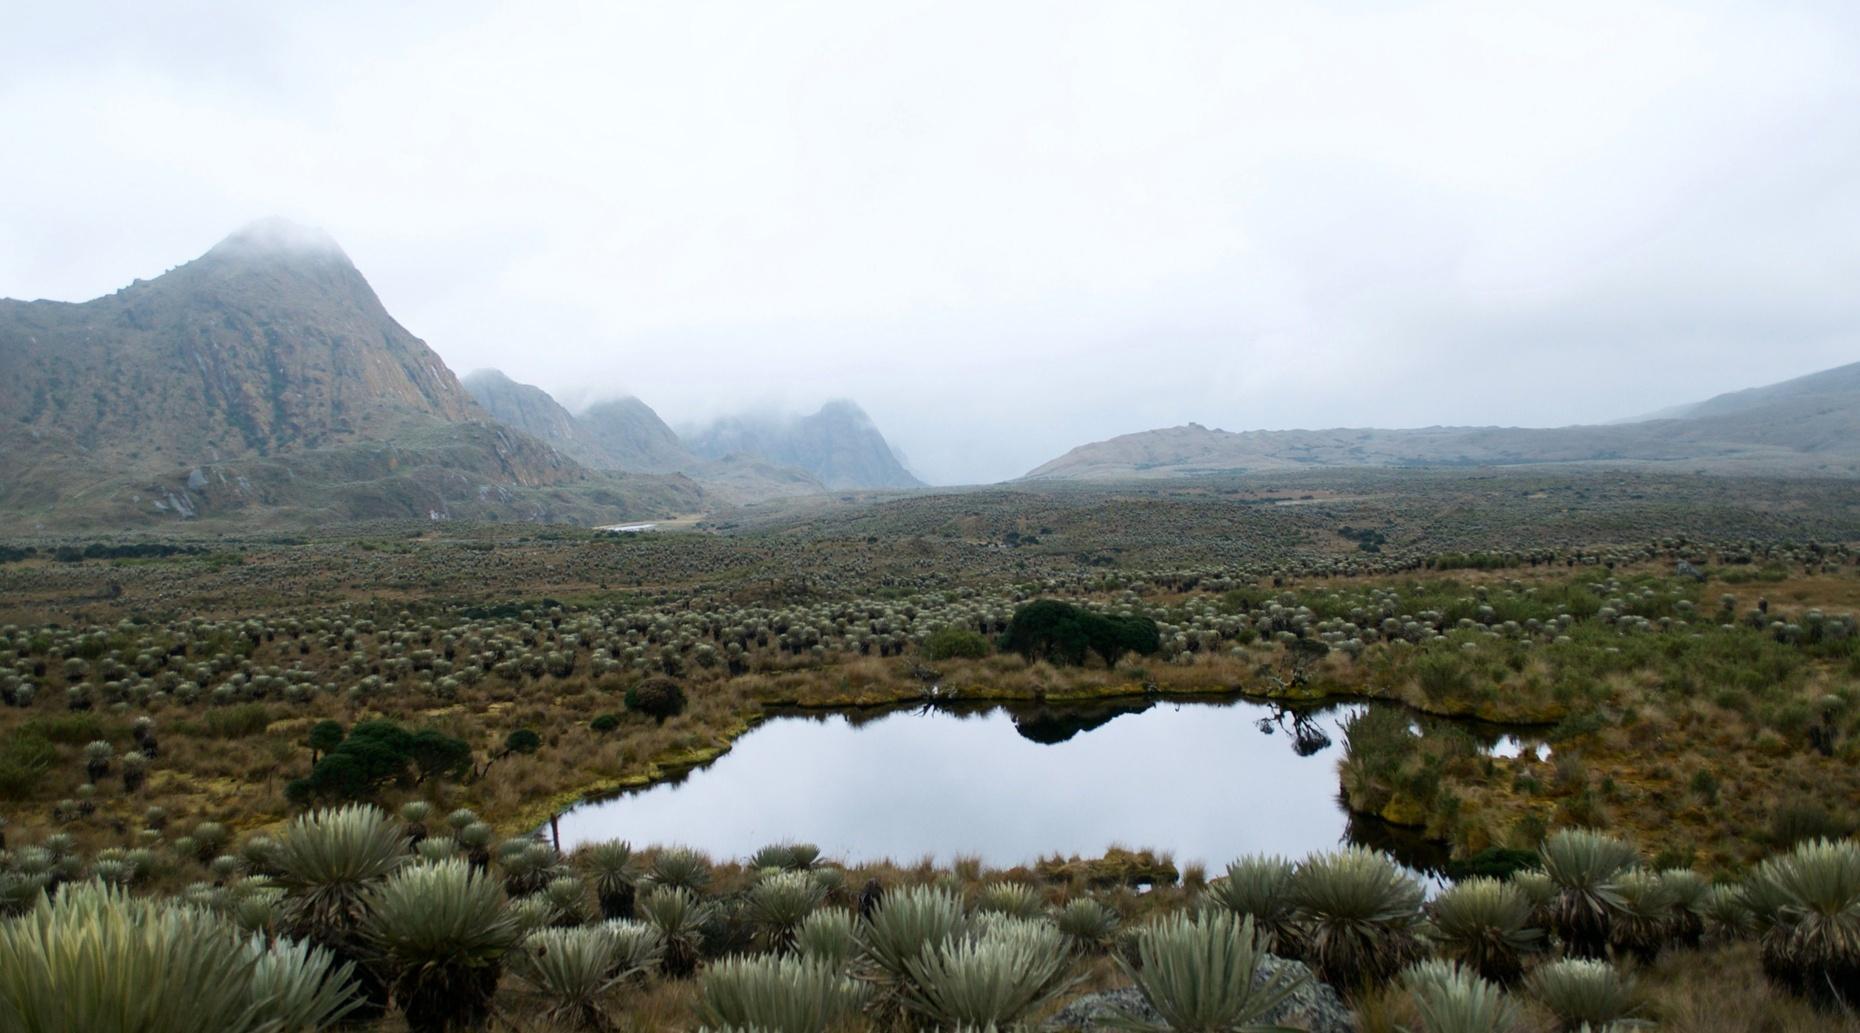 Full-Day Hiking Tour to Sumapaz